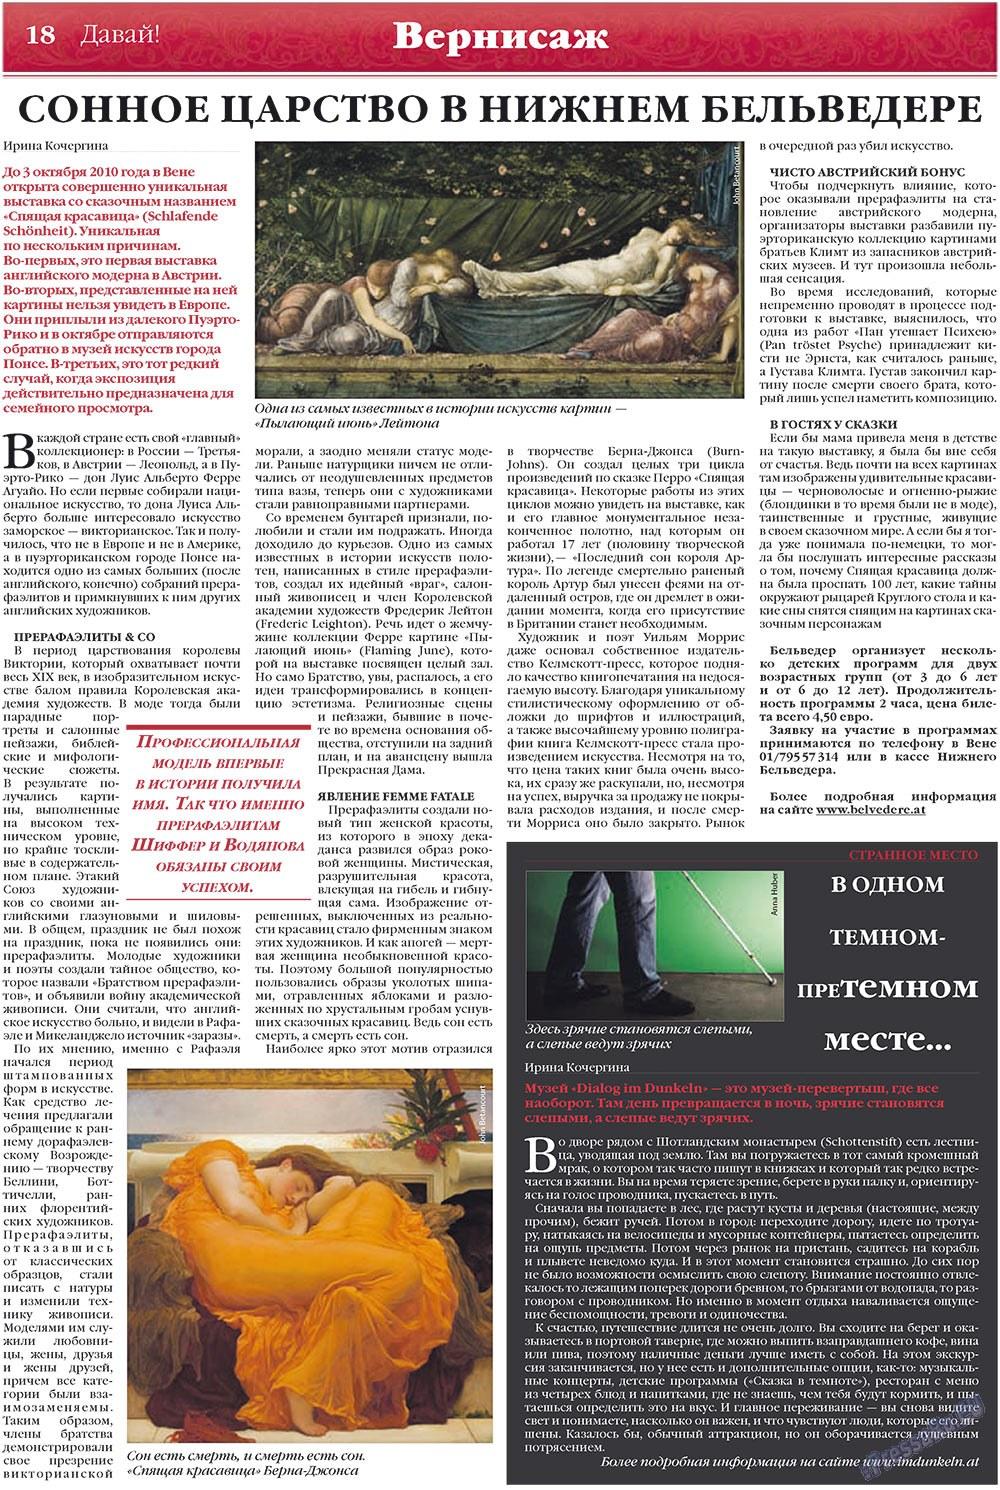 Давай (газета). 2010 год, номер 8, стр. 18